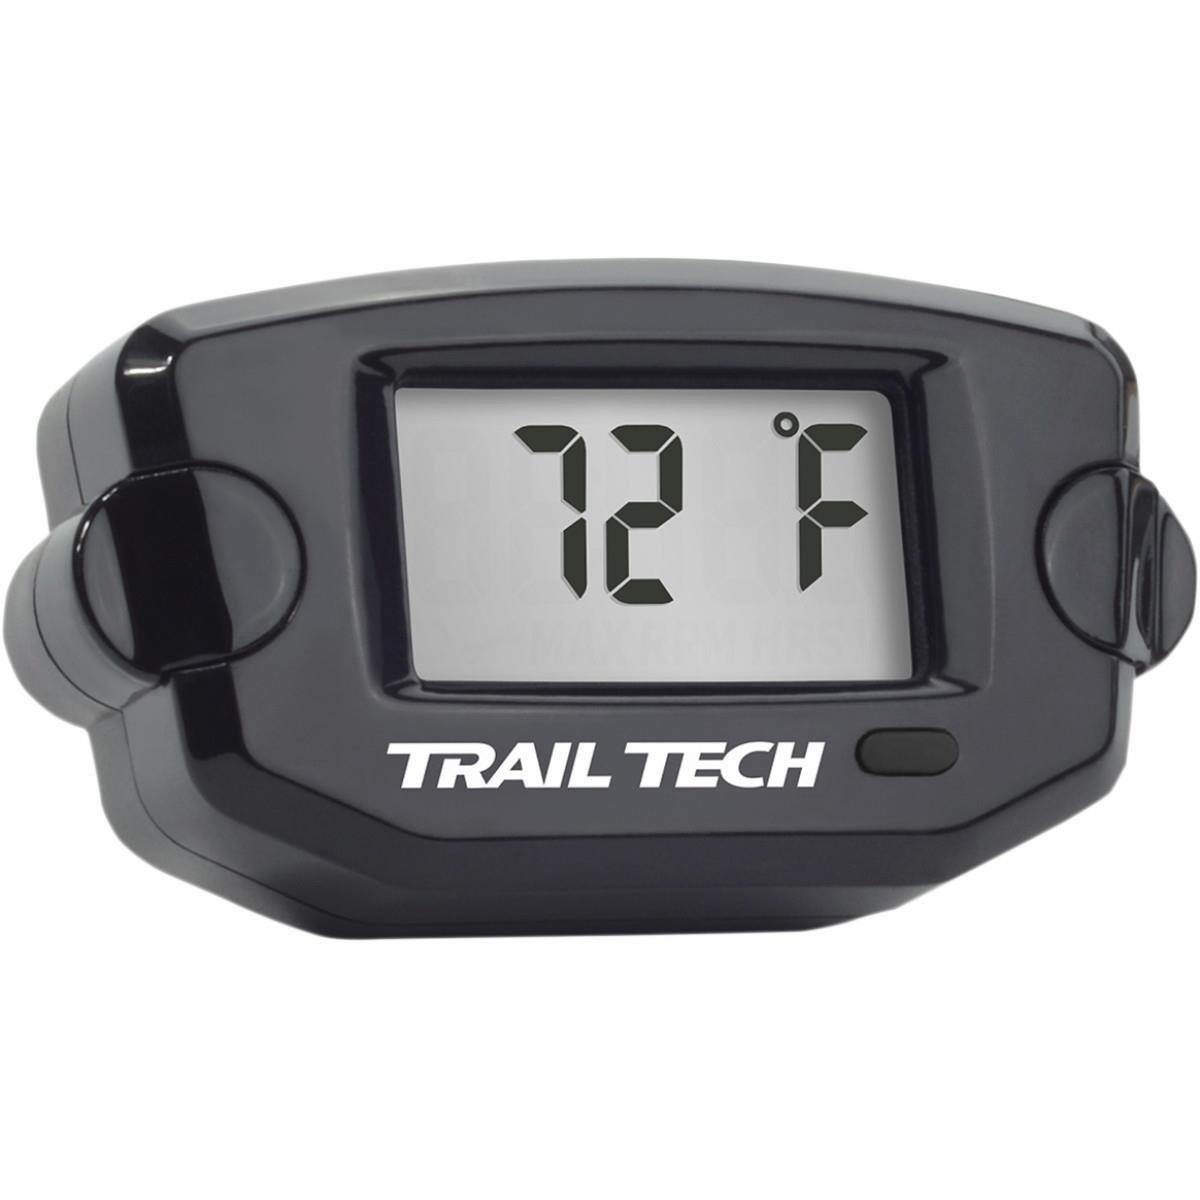 Trail Tech Panel Mount Universal Temperature Meter w/ Spark Plug Sensor for Air Cooled Engines - 14mm - Black 732ET3